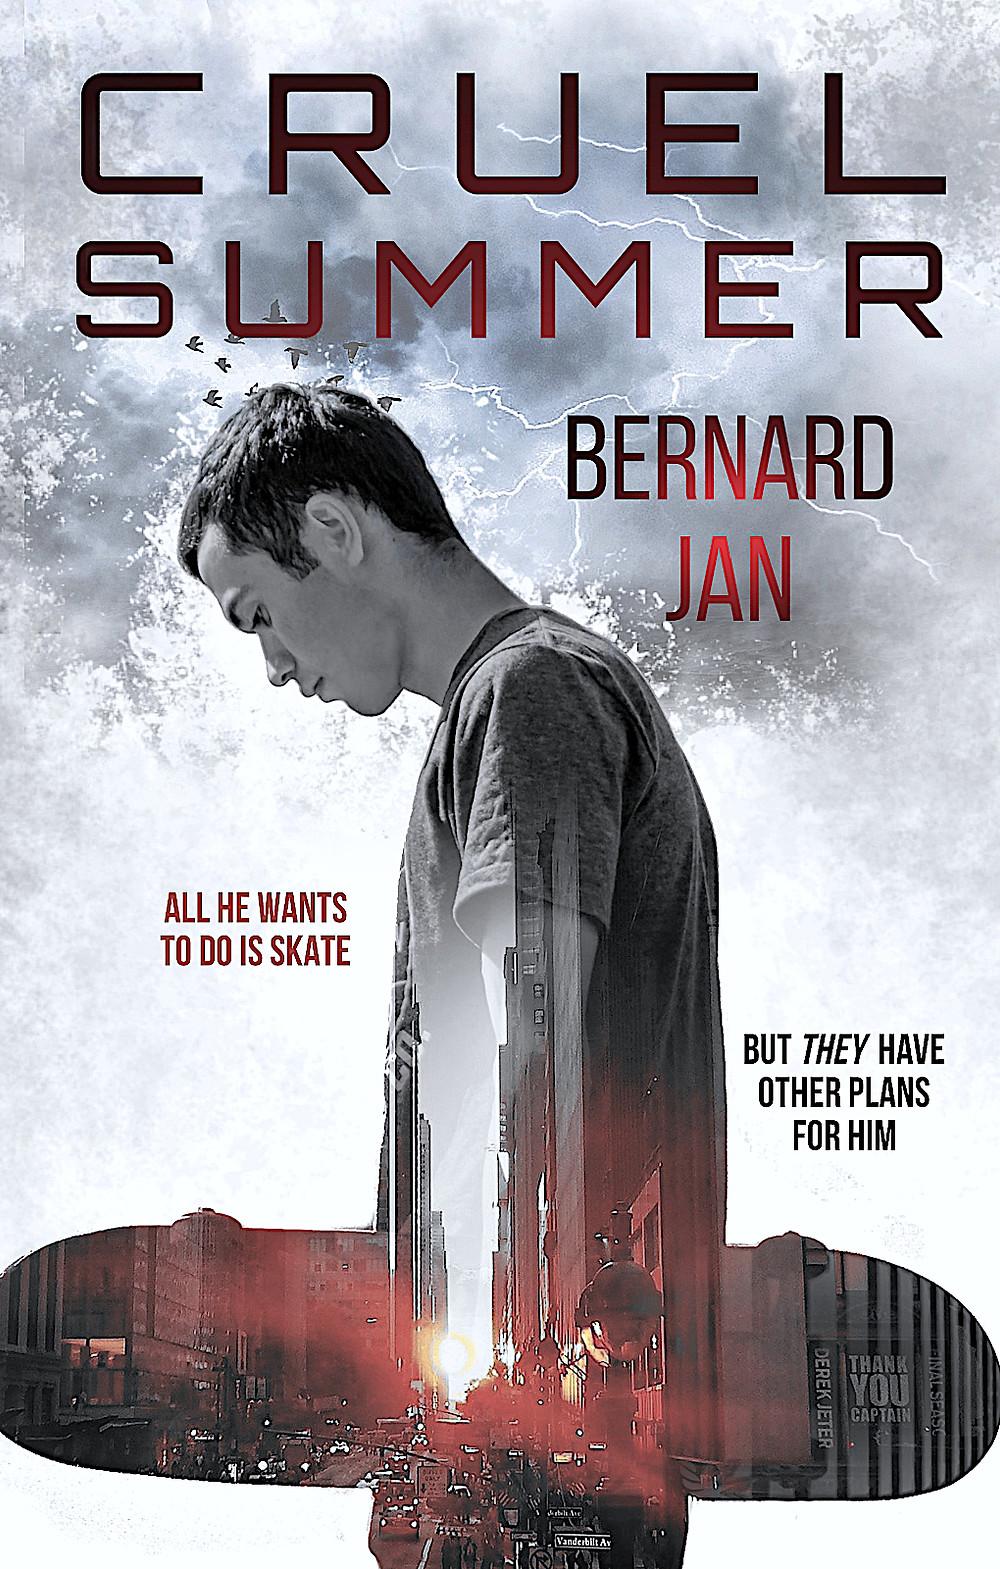 Cruel Summer by Bernard Jan eBook cover designed by Dean Cole